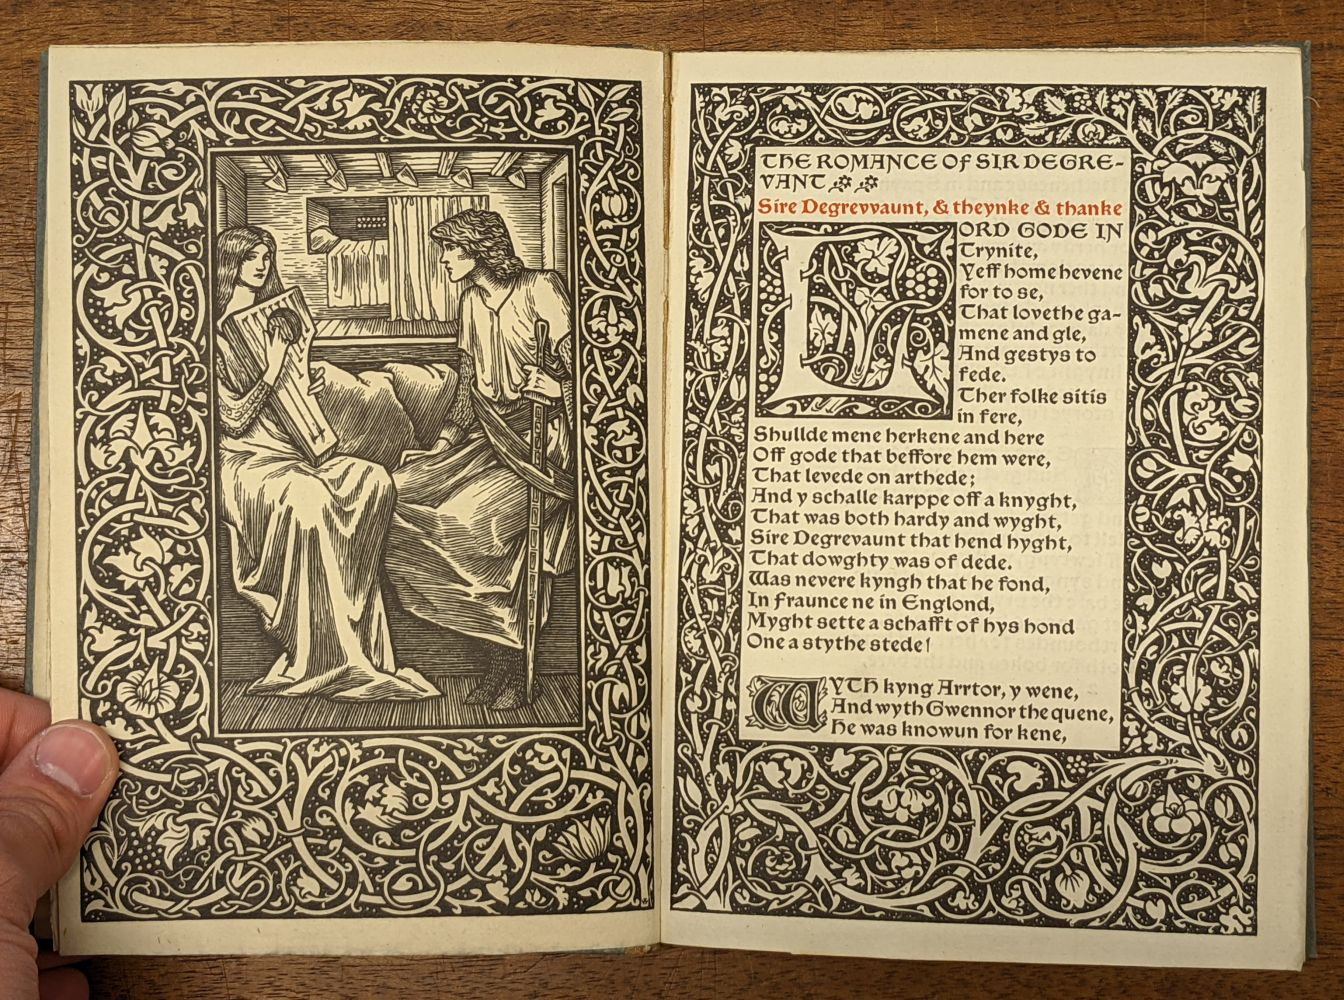 Kelmscott Press. The Romance of Sir Degrevant, 1896 - Image 5 of 8